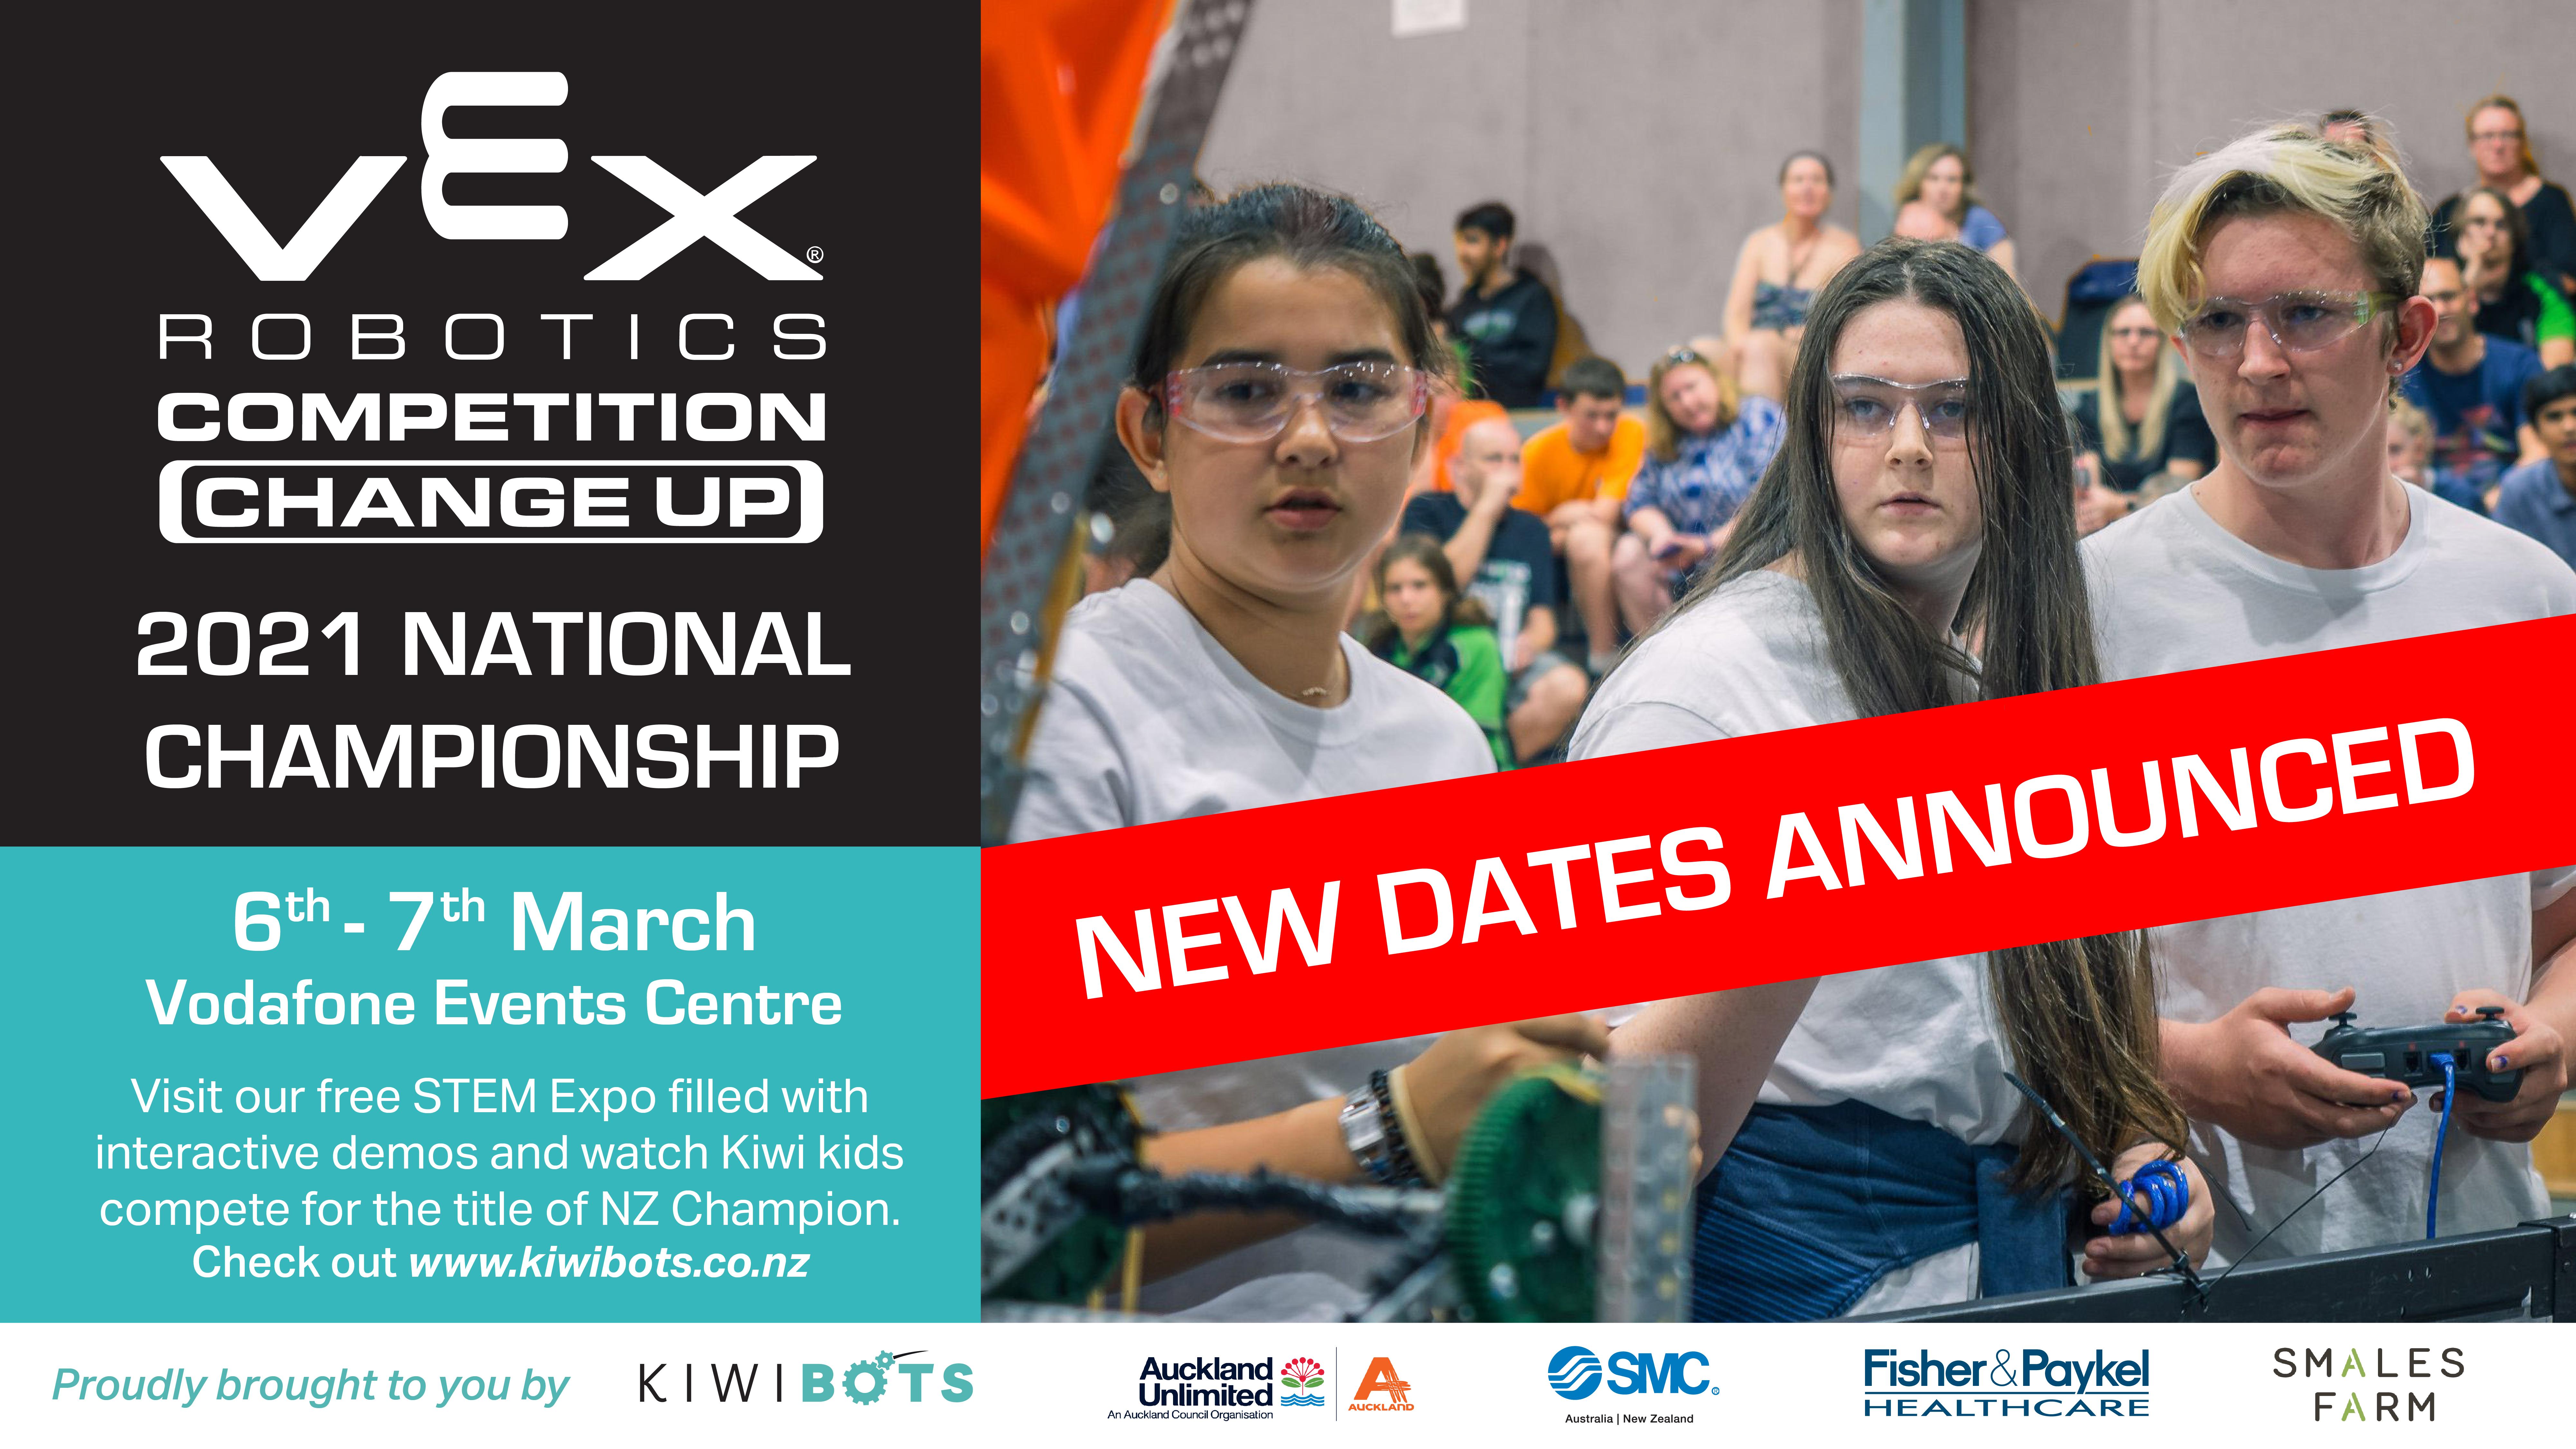 2021 New Zealand VRC National Championship Series - Auckland